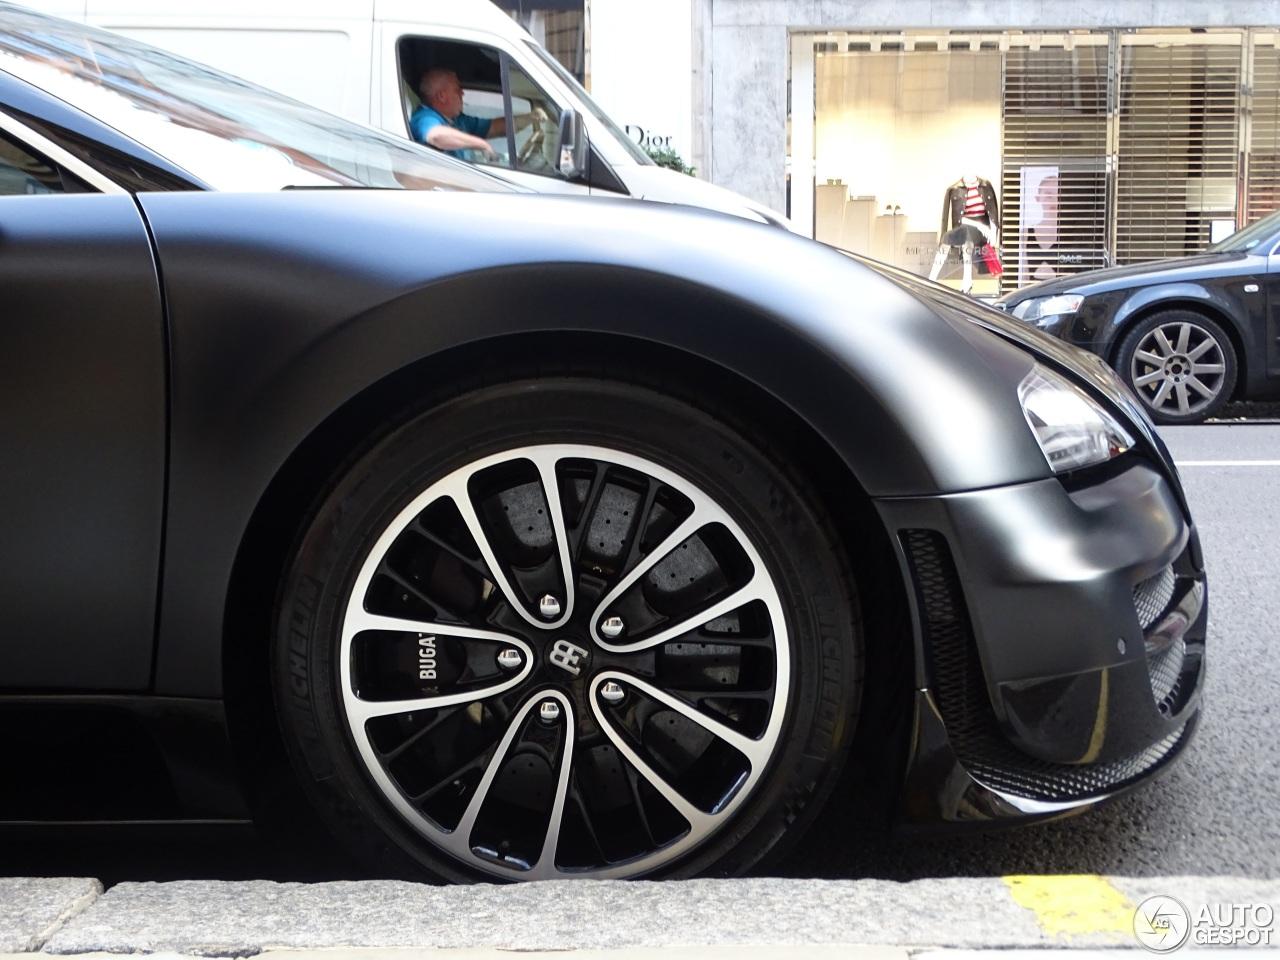 bugatti veyron 16 4 super sport sang noir 11 july 2015 autogespot. Cars Review. Best American Auto & Cars Review